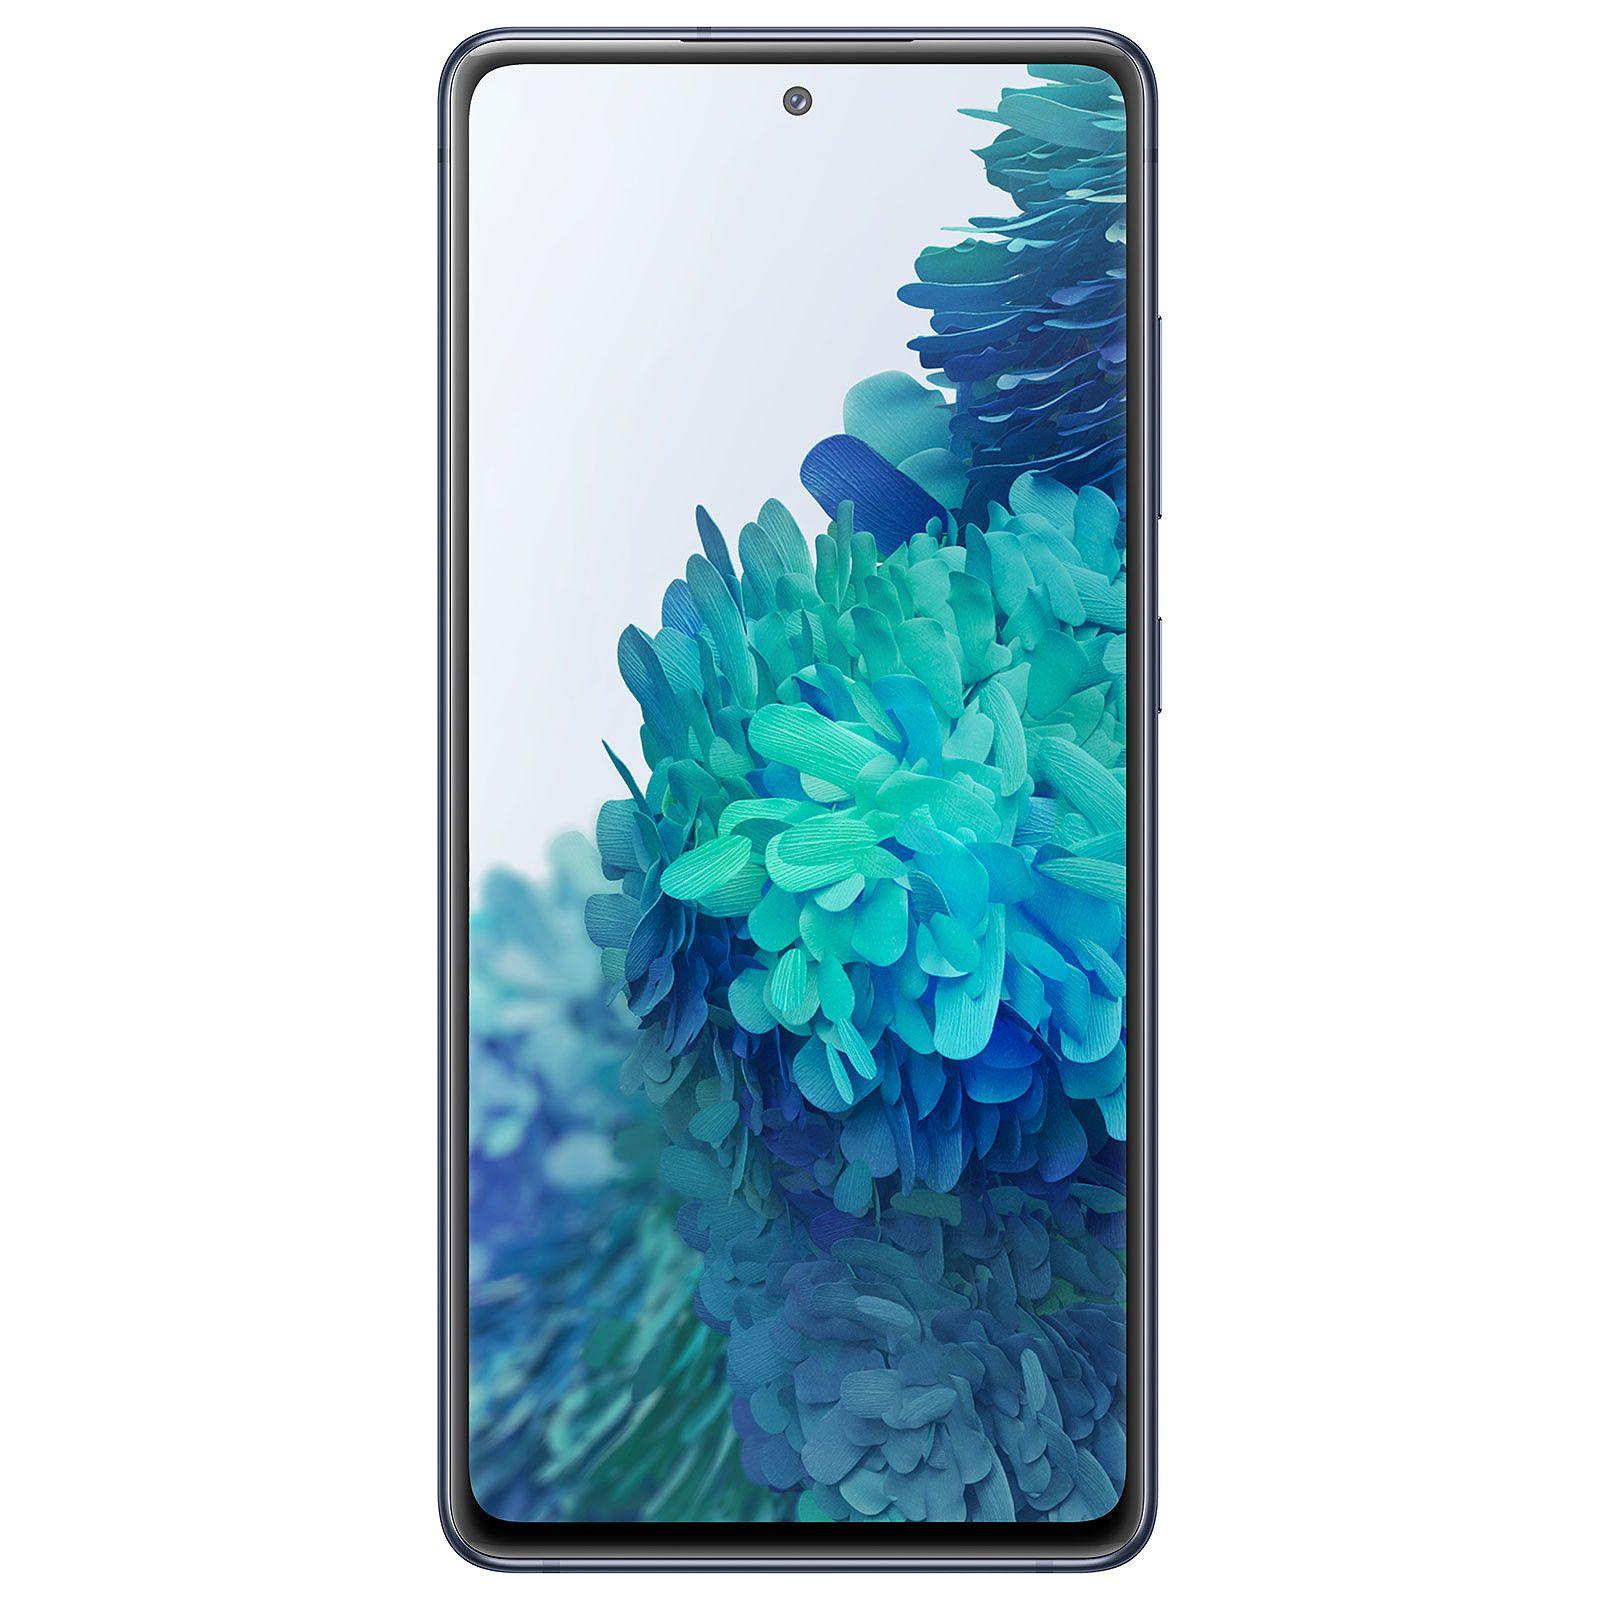 "Samsung Galaxy S20 FE 5G 128/8GB (Snapdragon 865, 6.5"" 120Hz Amoled Display, 4500mAh Akku, Wireless Charging, IP68 Wasserdicht, NFC)"